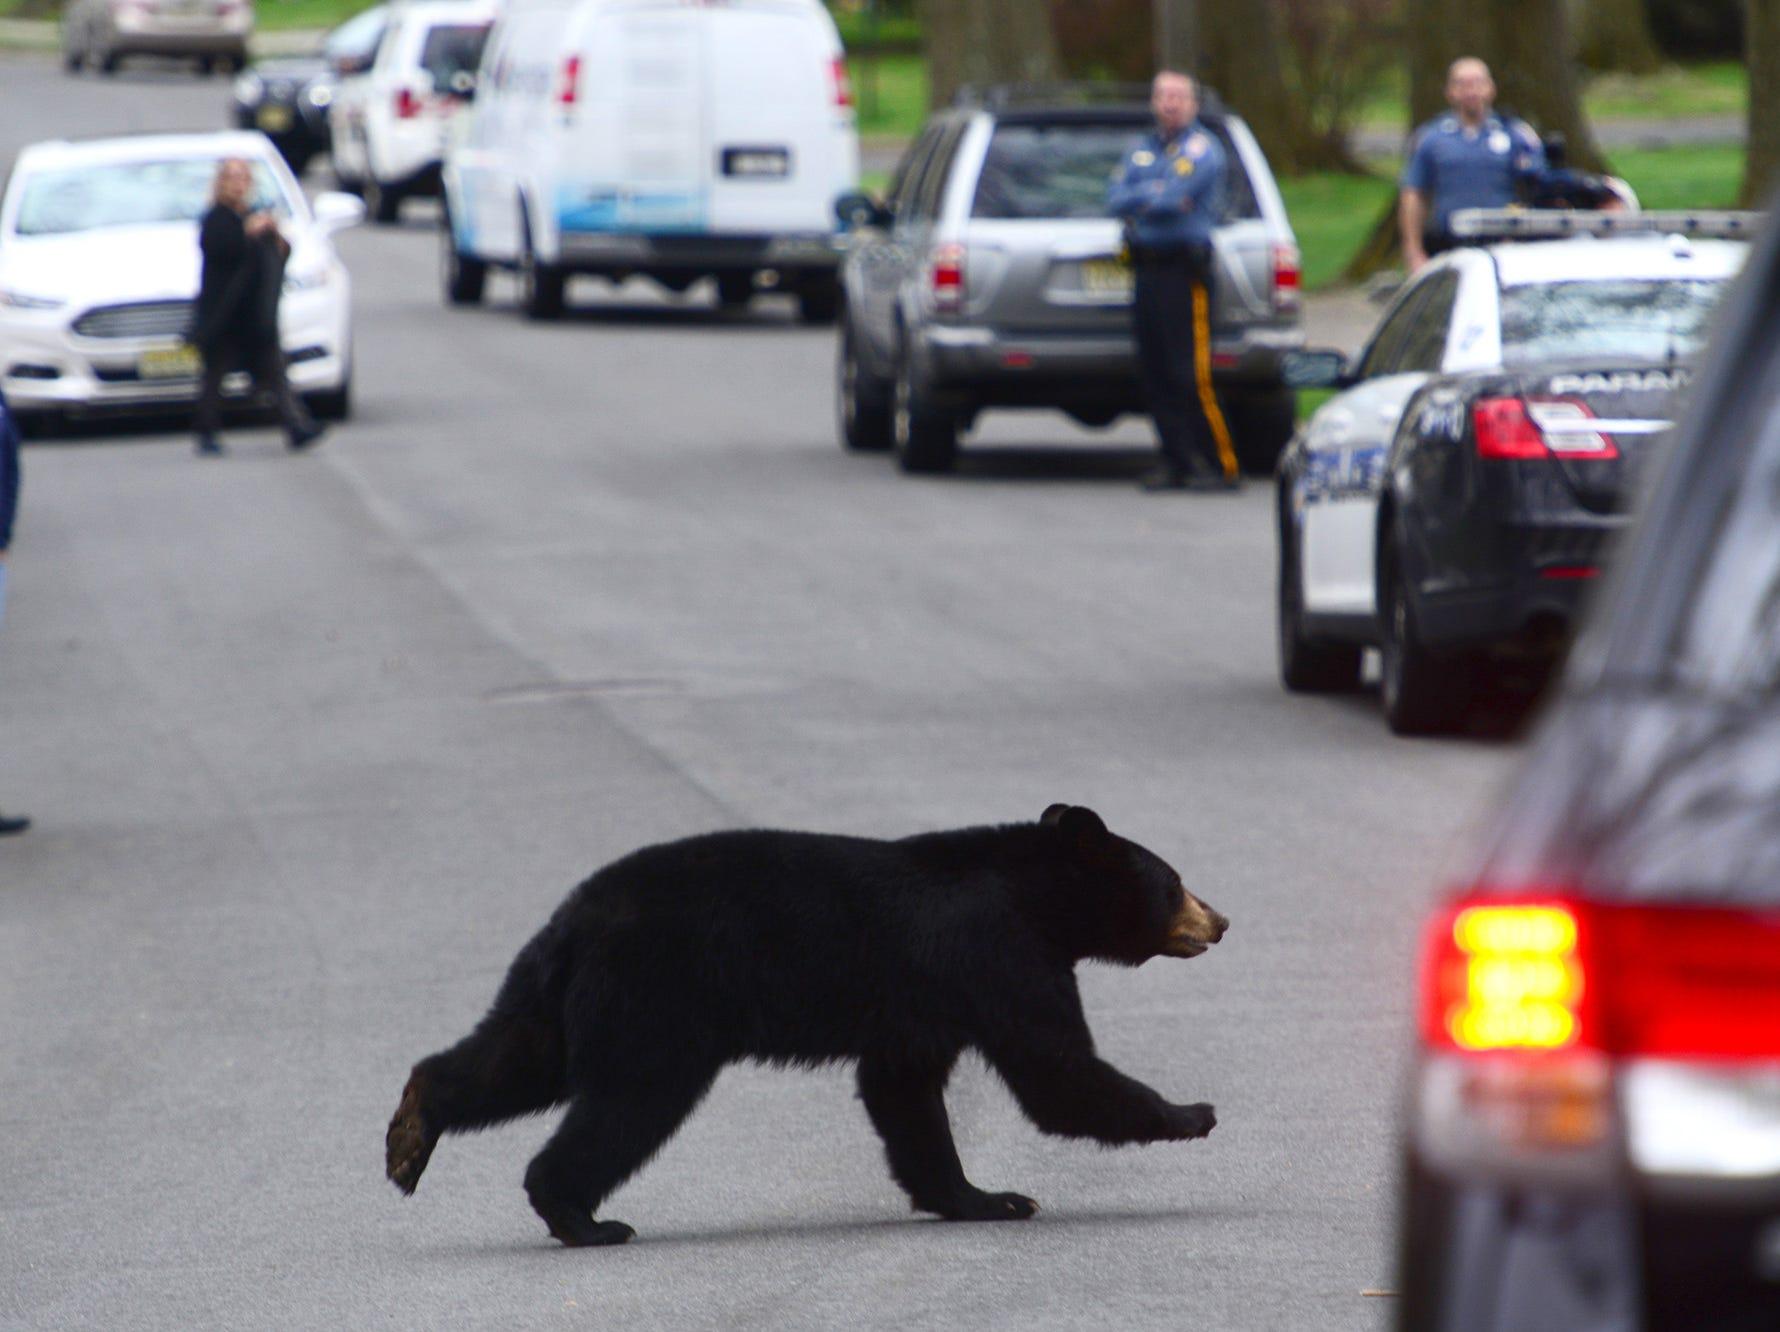 A black bear runs across Benton Road in Paramus on Monday April 30, 2018.